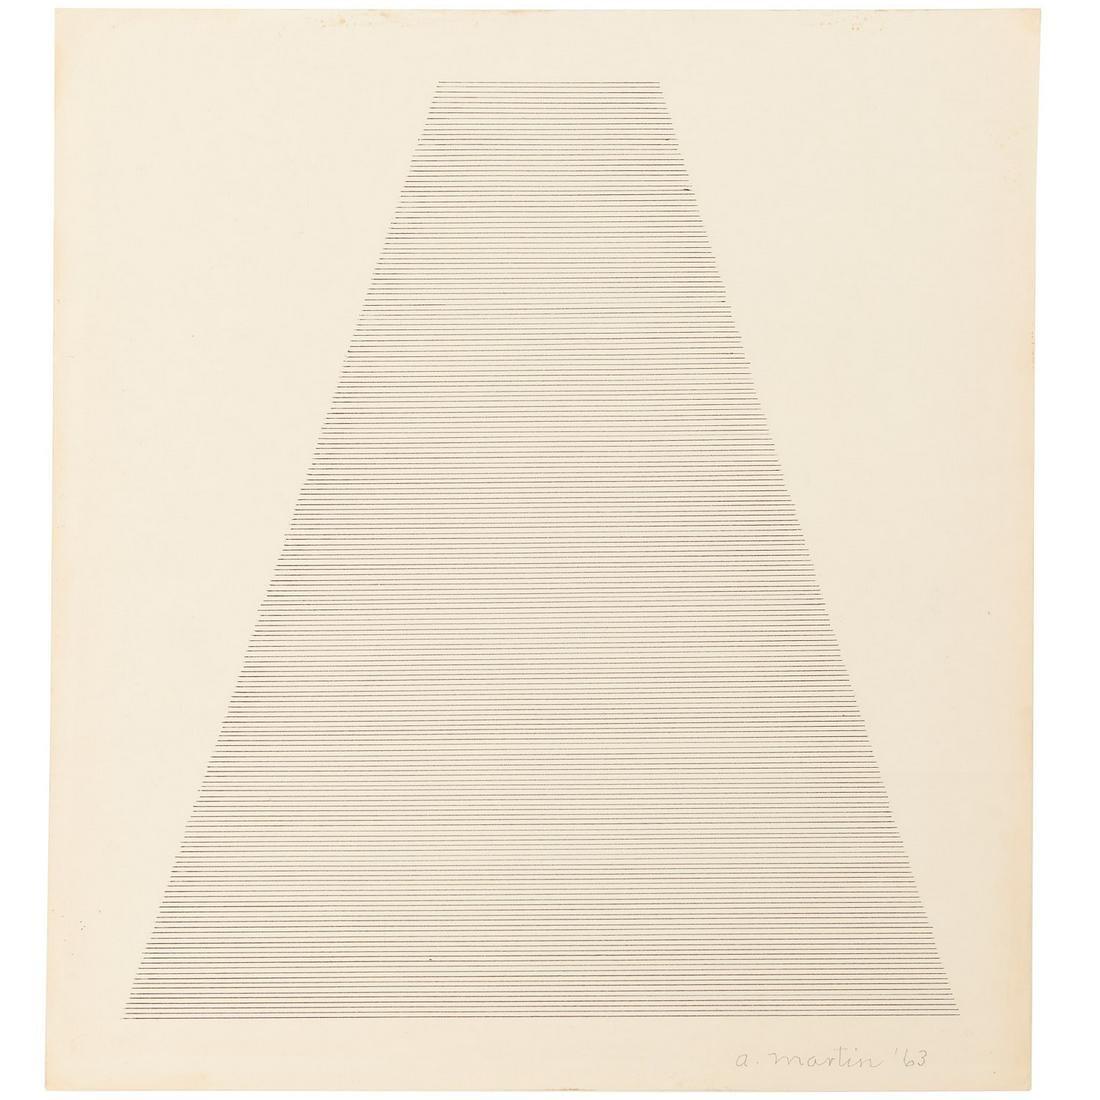 Agnes Martin (attrib.), ink drawing, 1963